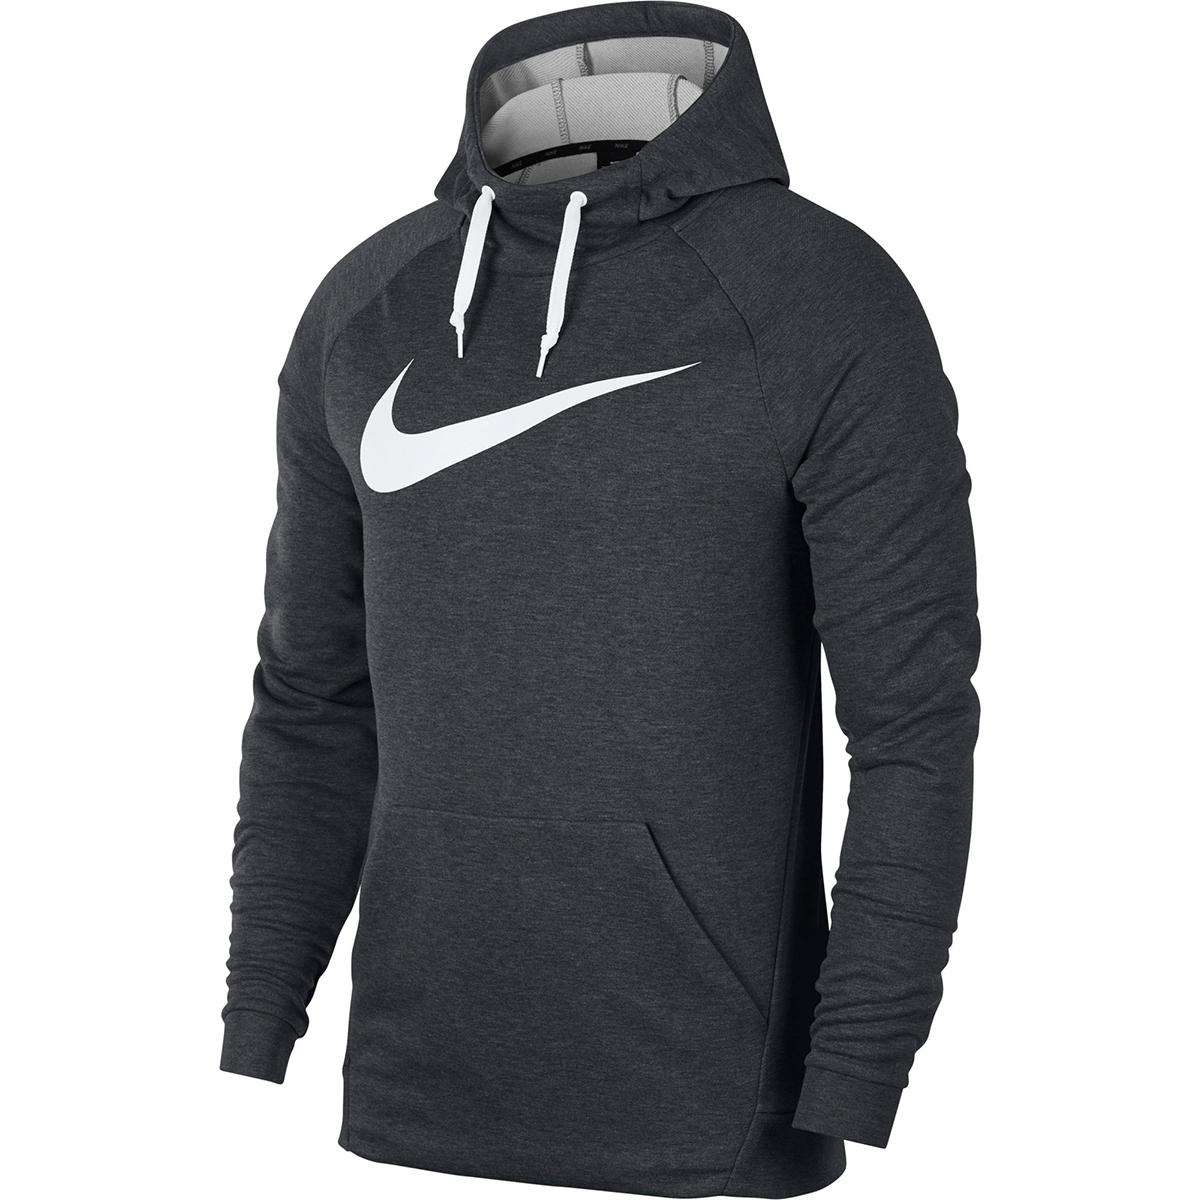 Nike Men's Dri-Fit Training Pullover Hoodie - Black, L